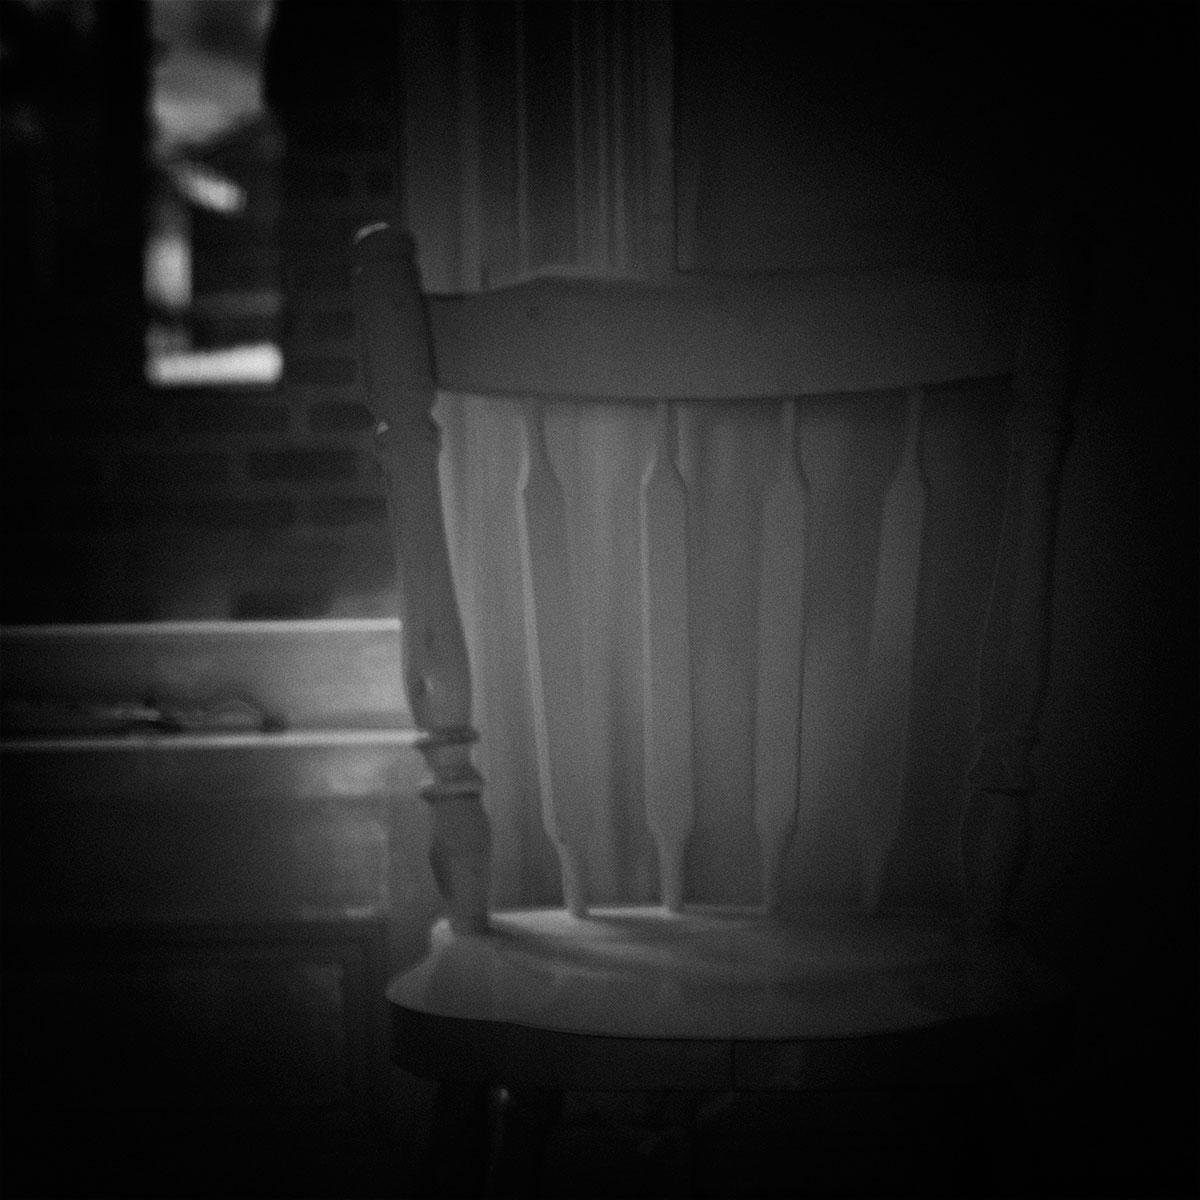 Seat by PeterA in Regular Member Gallery